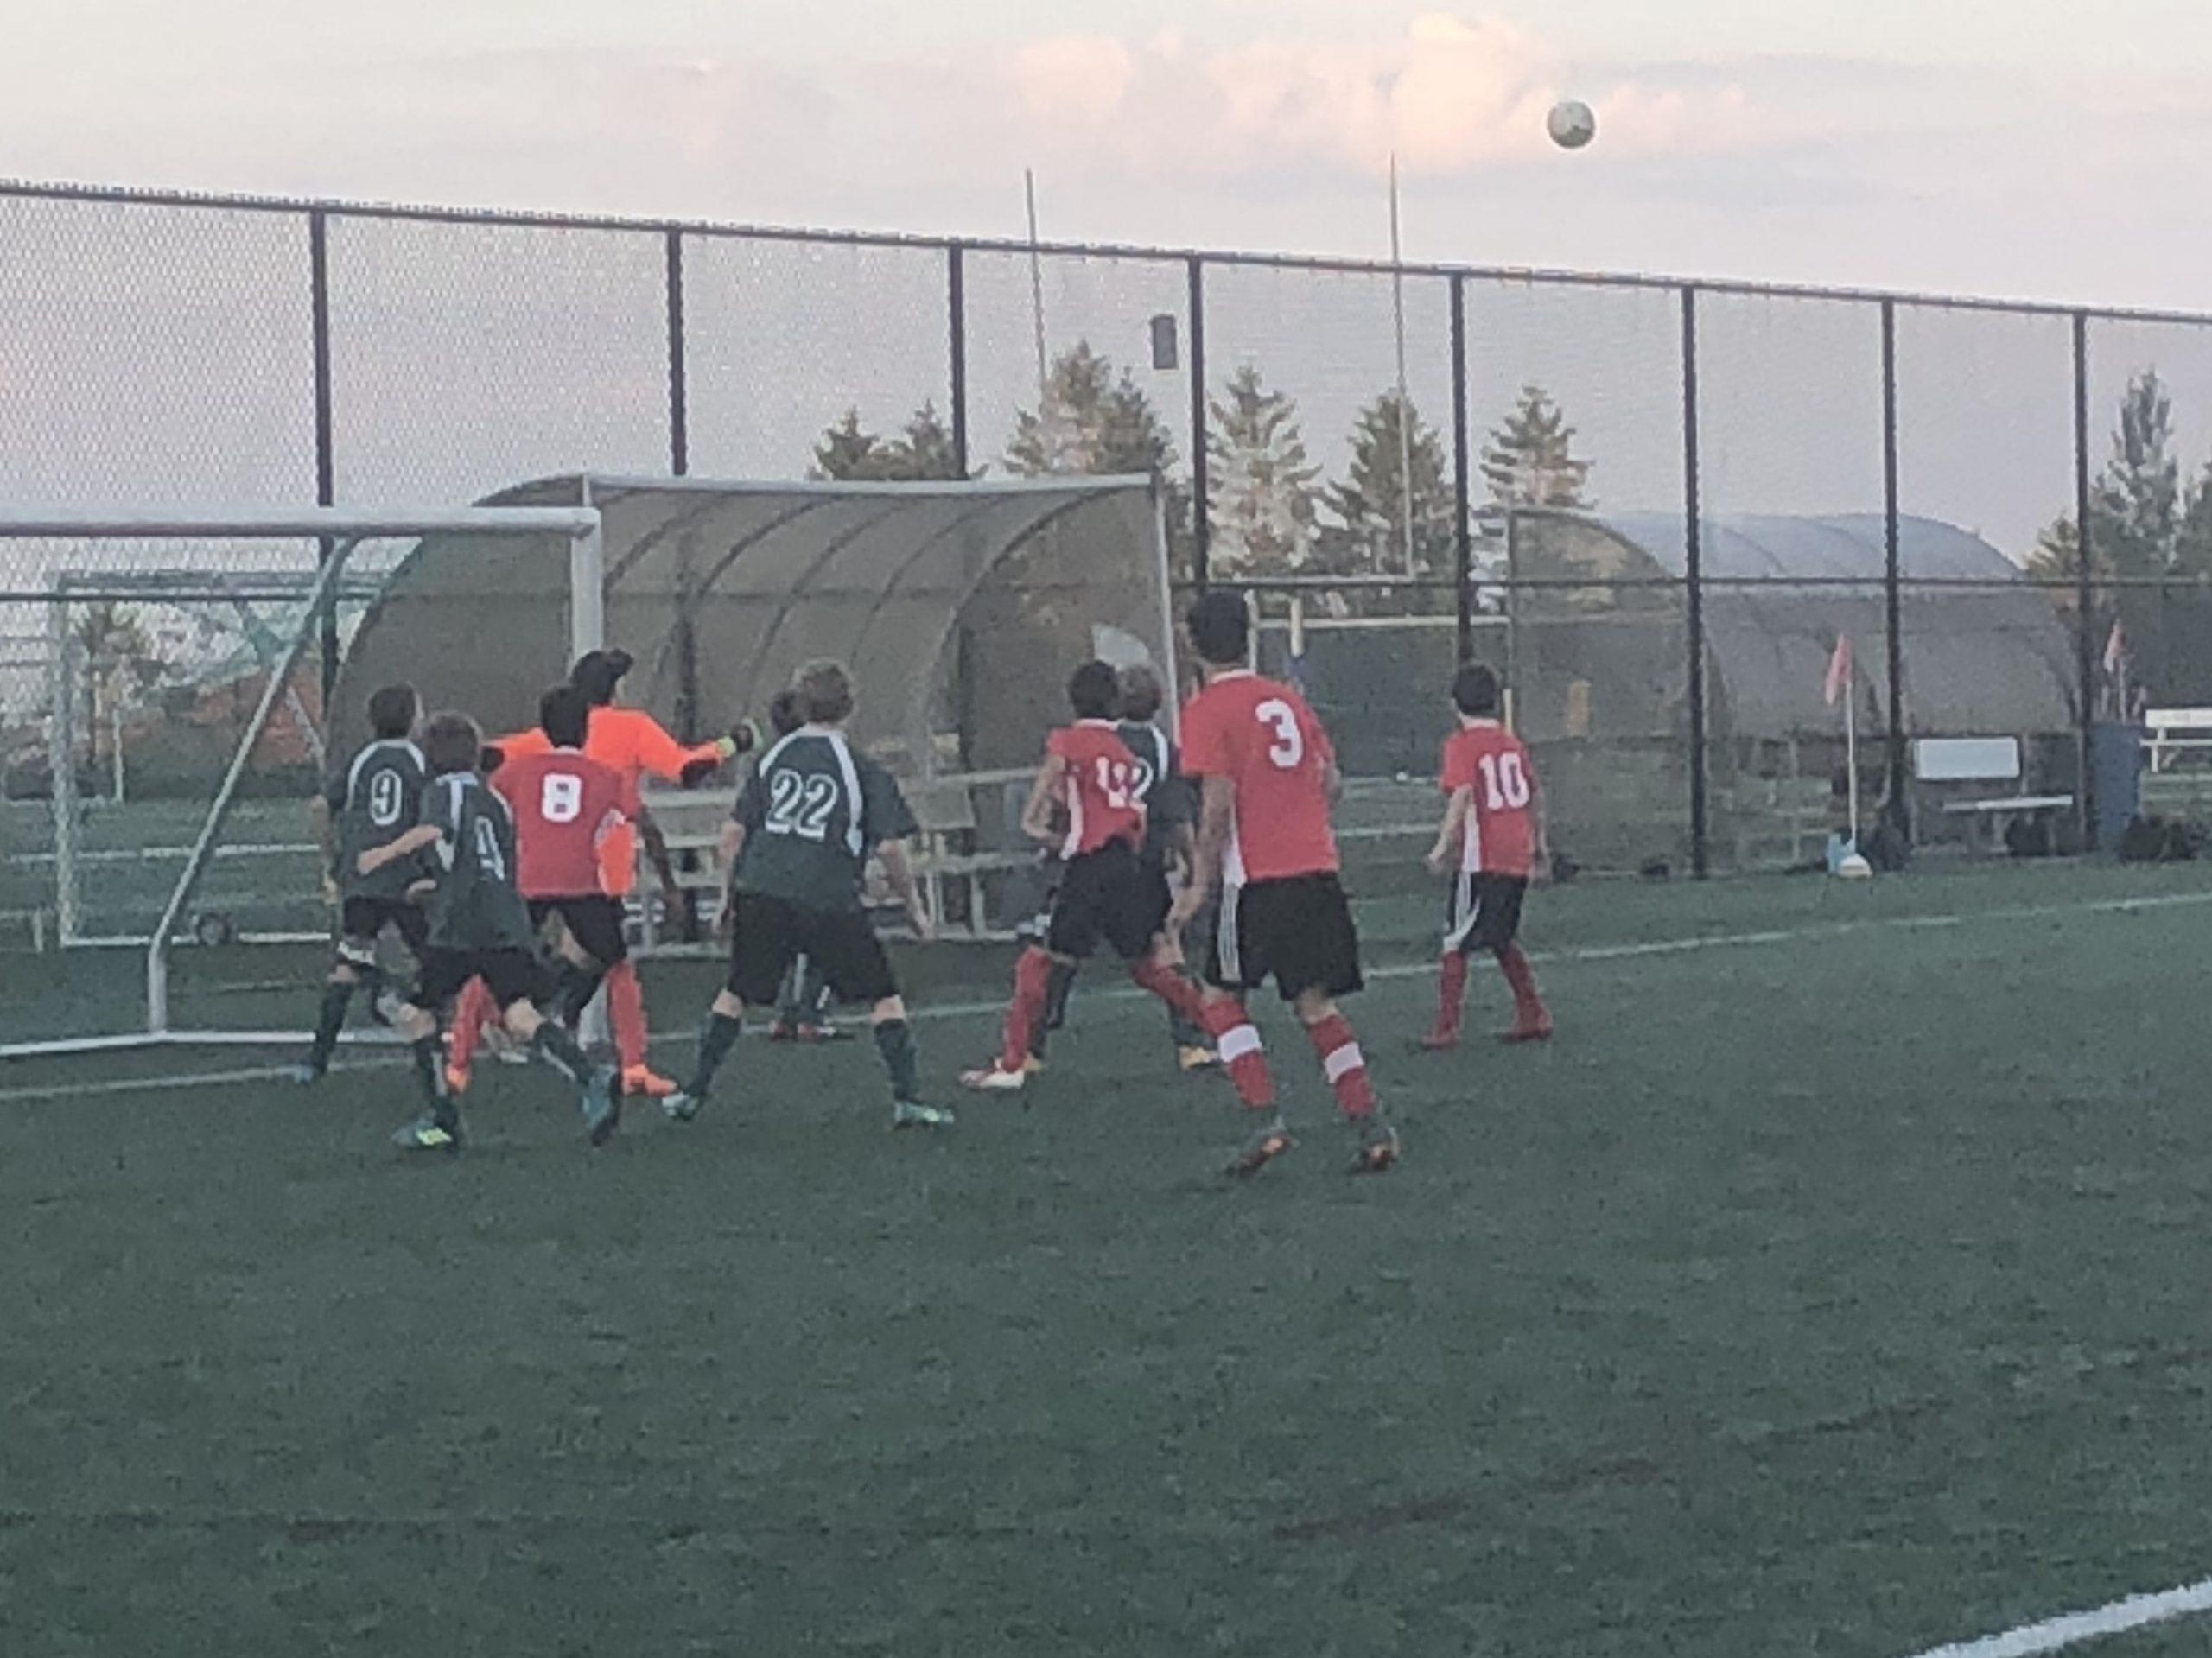 Nova Scotia Soccer League/U13A boys results (from Halifax Thursday)